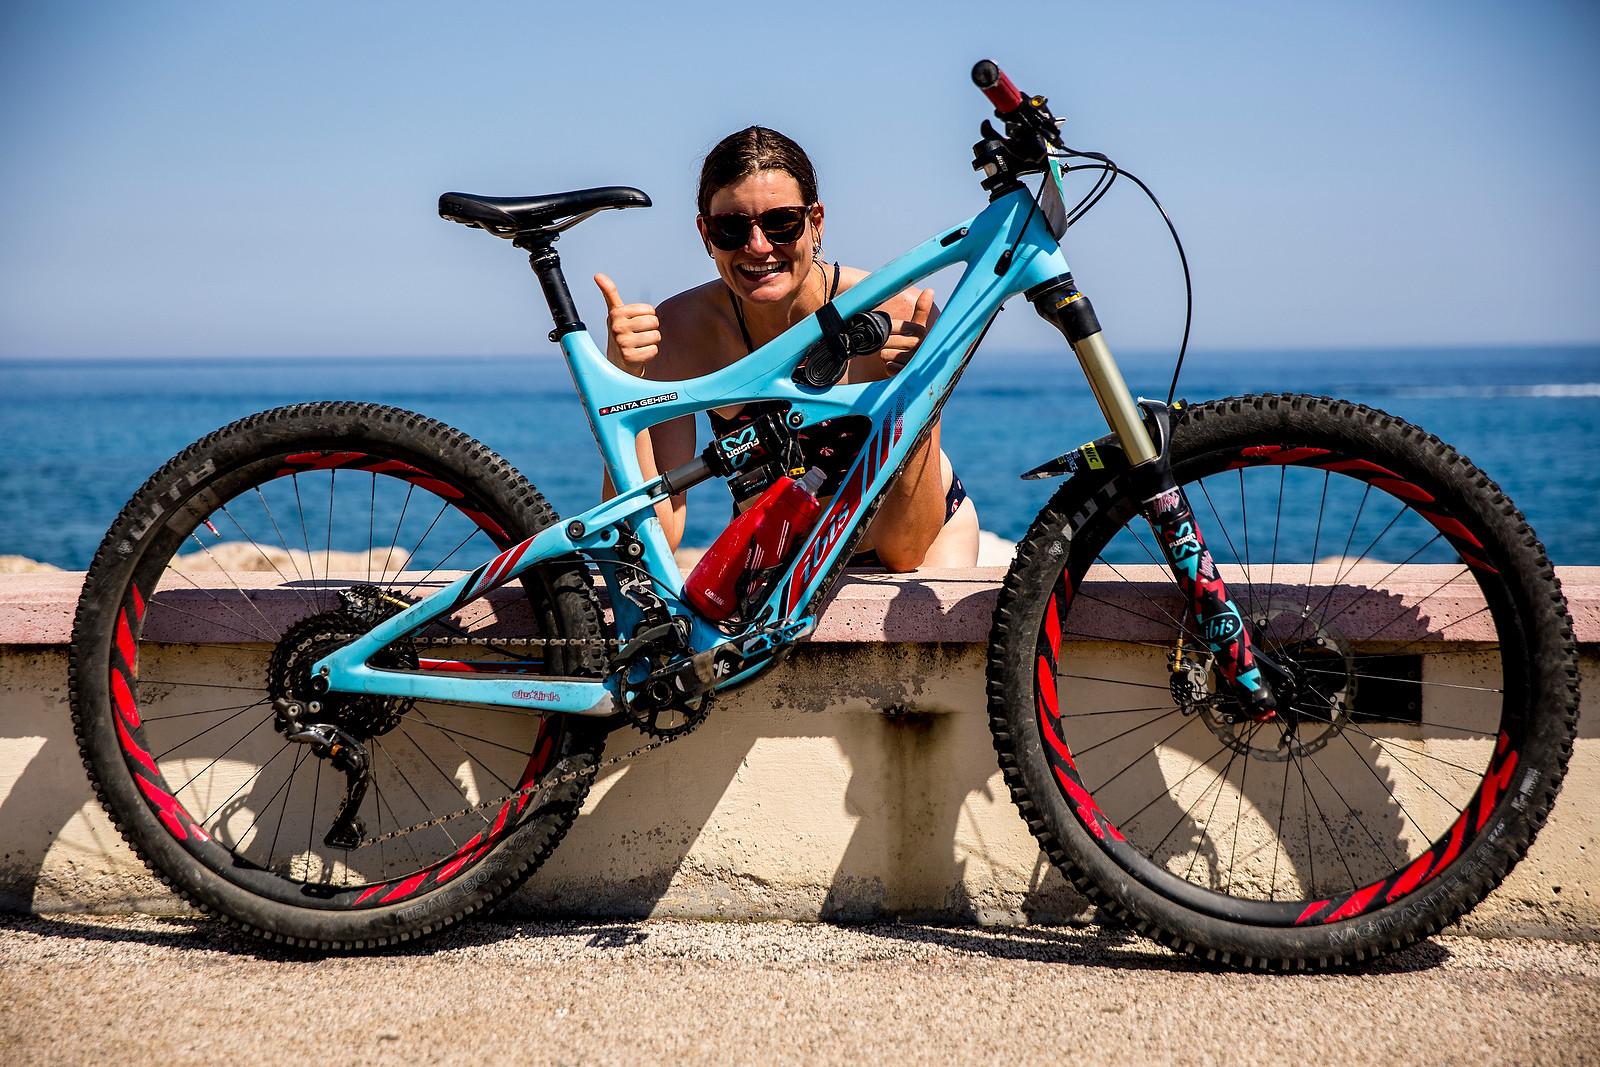 WINNING BIKE: Anita Gehrig's Ibis Mojo HD3 - WINNING BIKE: Anita Gehrig's Ibis Mojo HD3 - Mountain Biking Pictures - Vital MTB